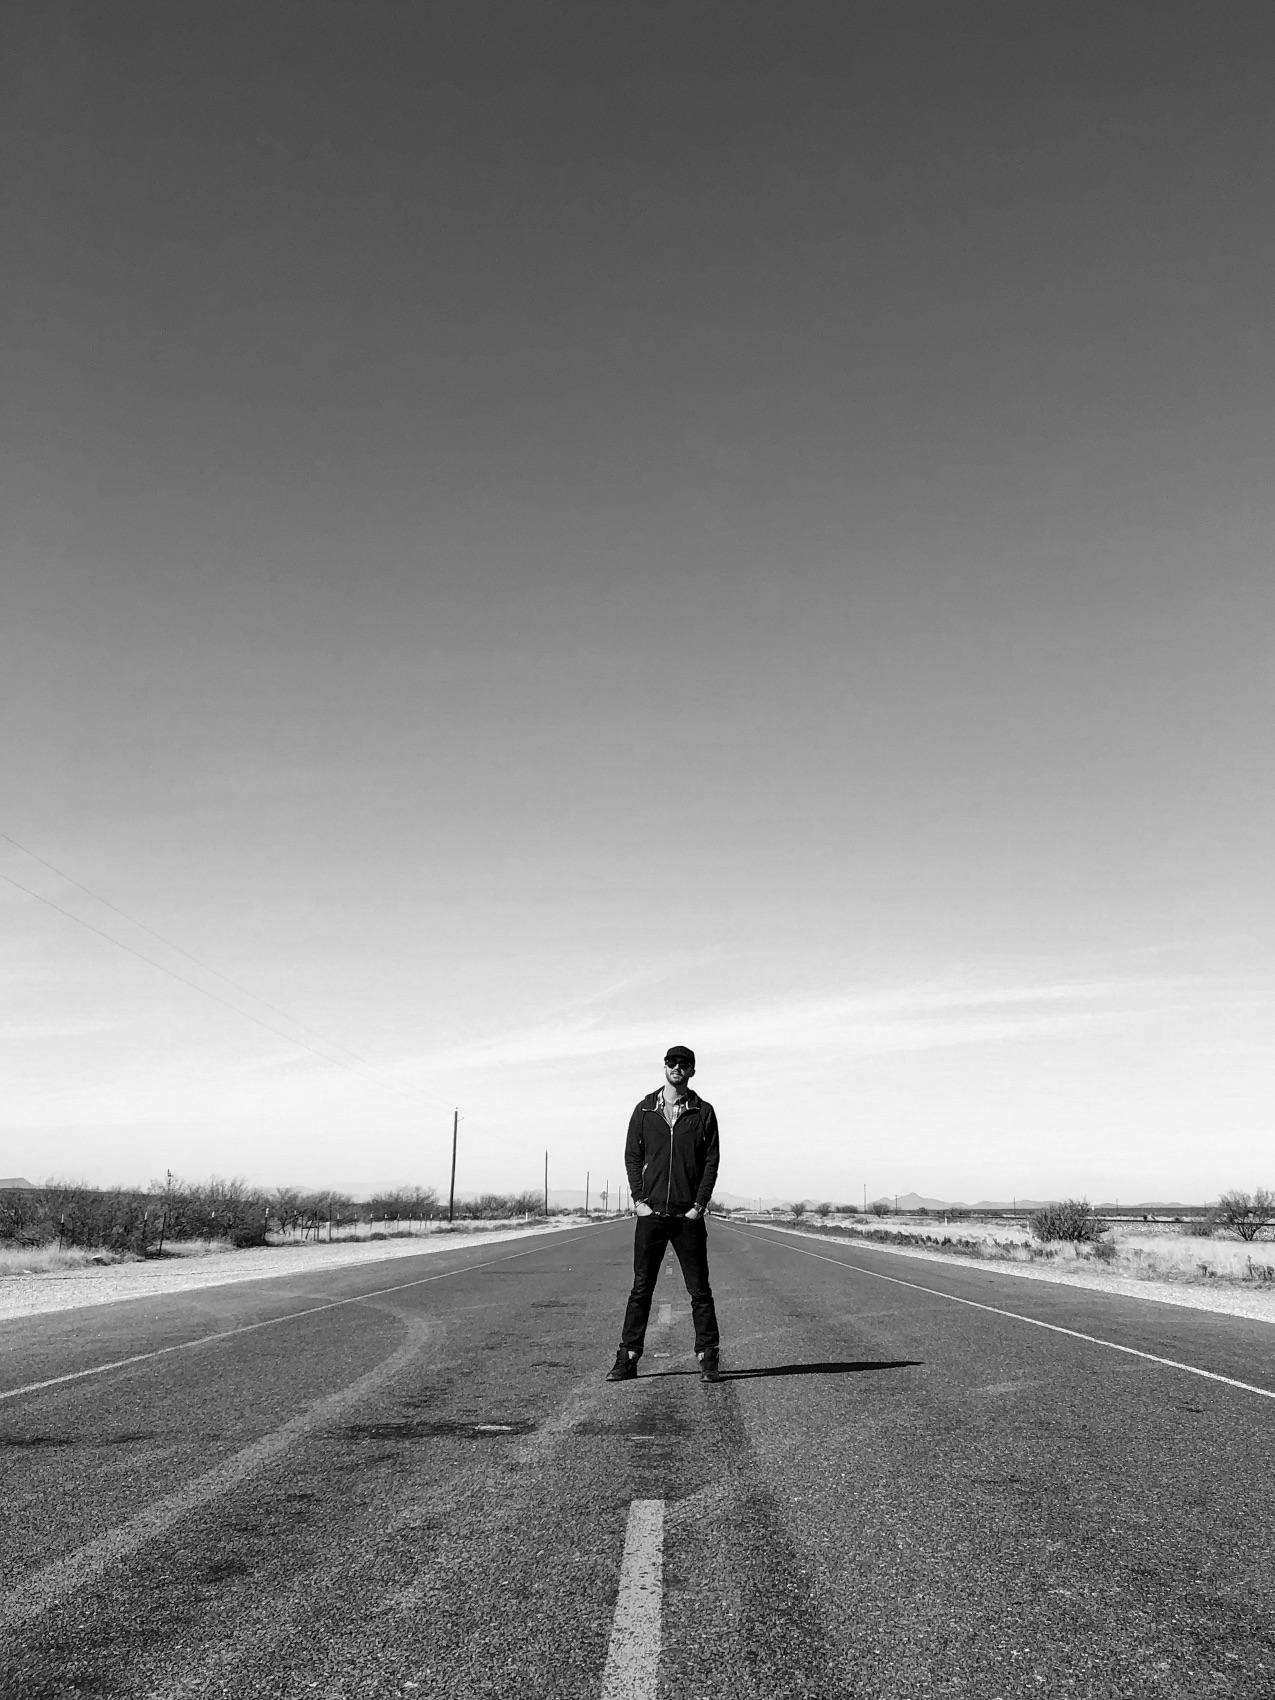 Max Miner standing in an empty highway